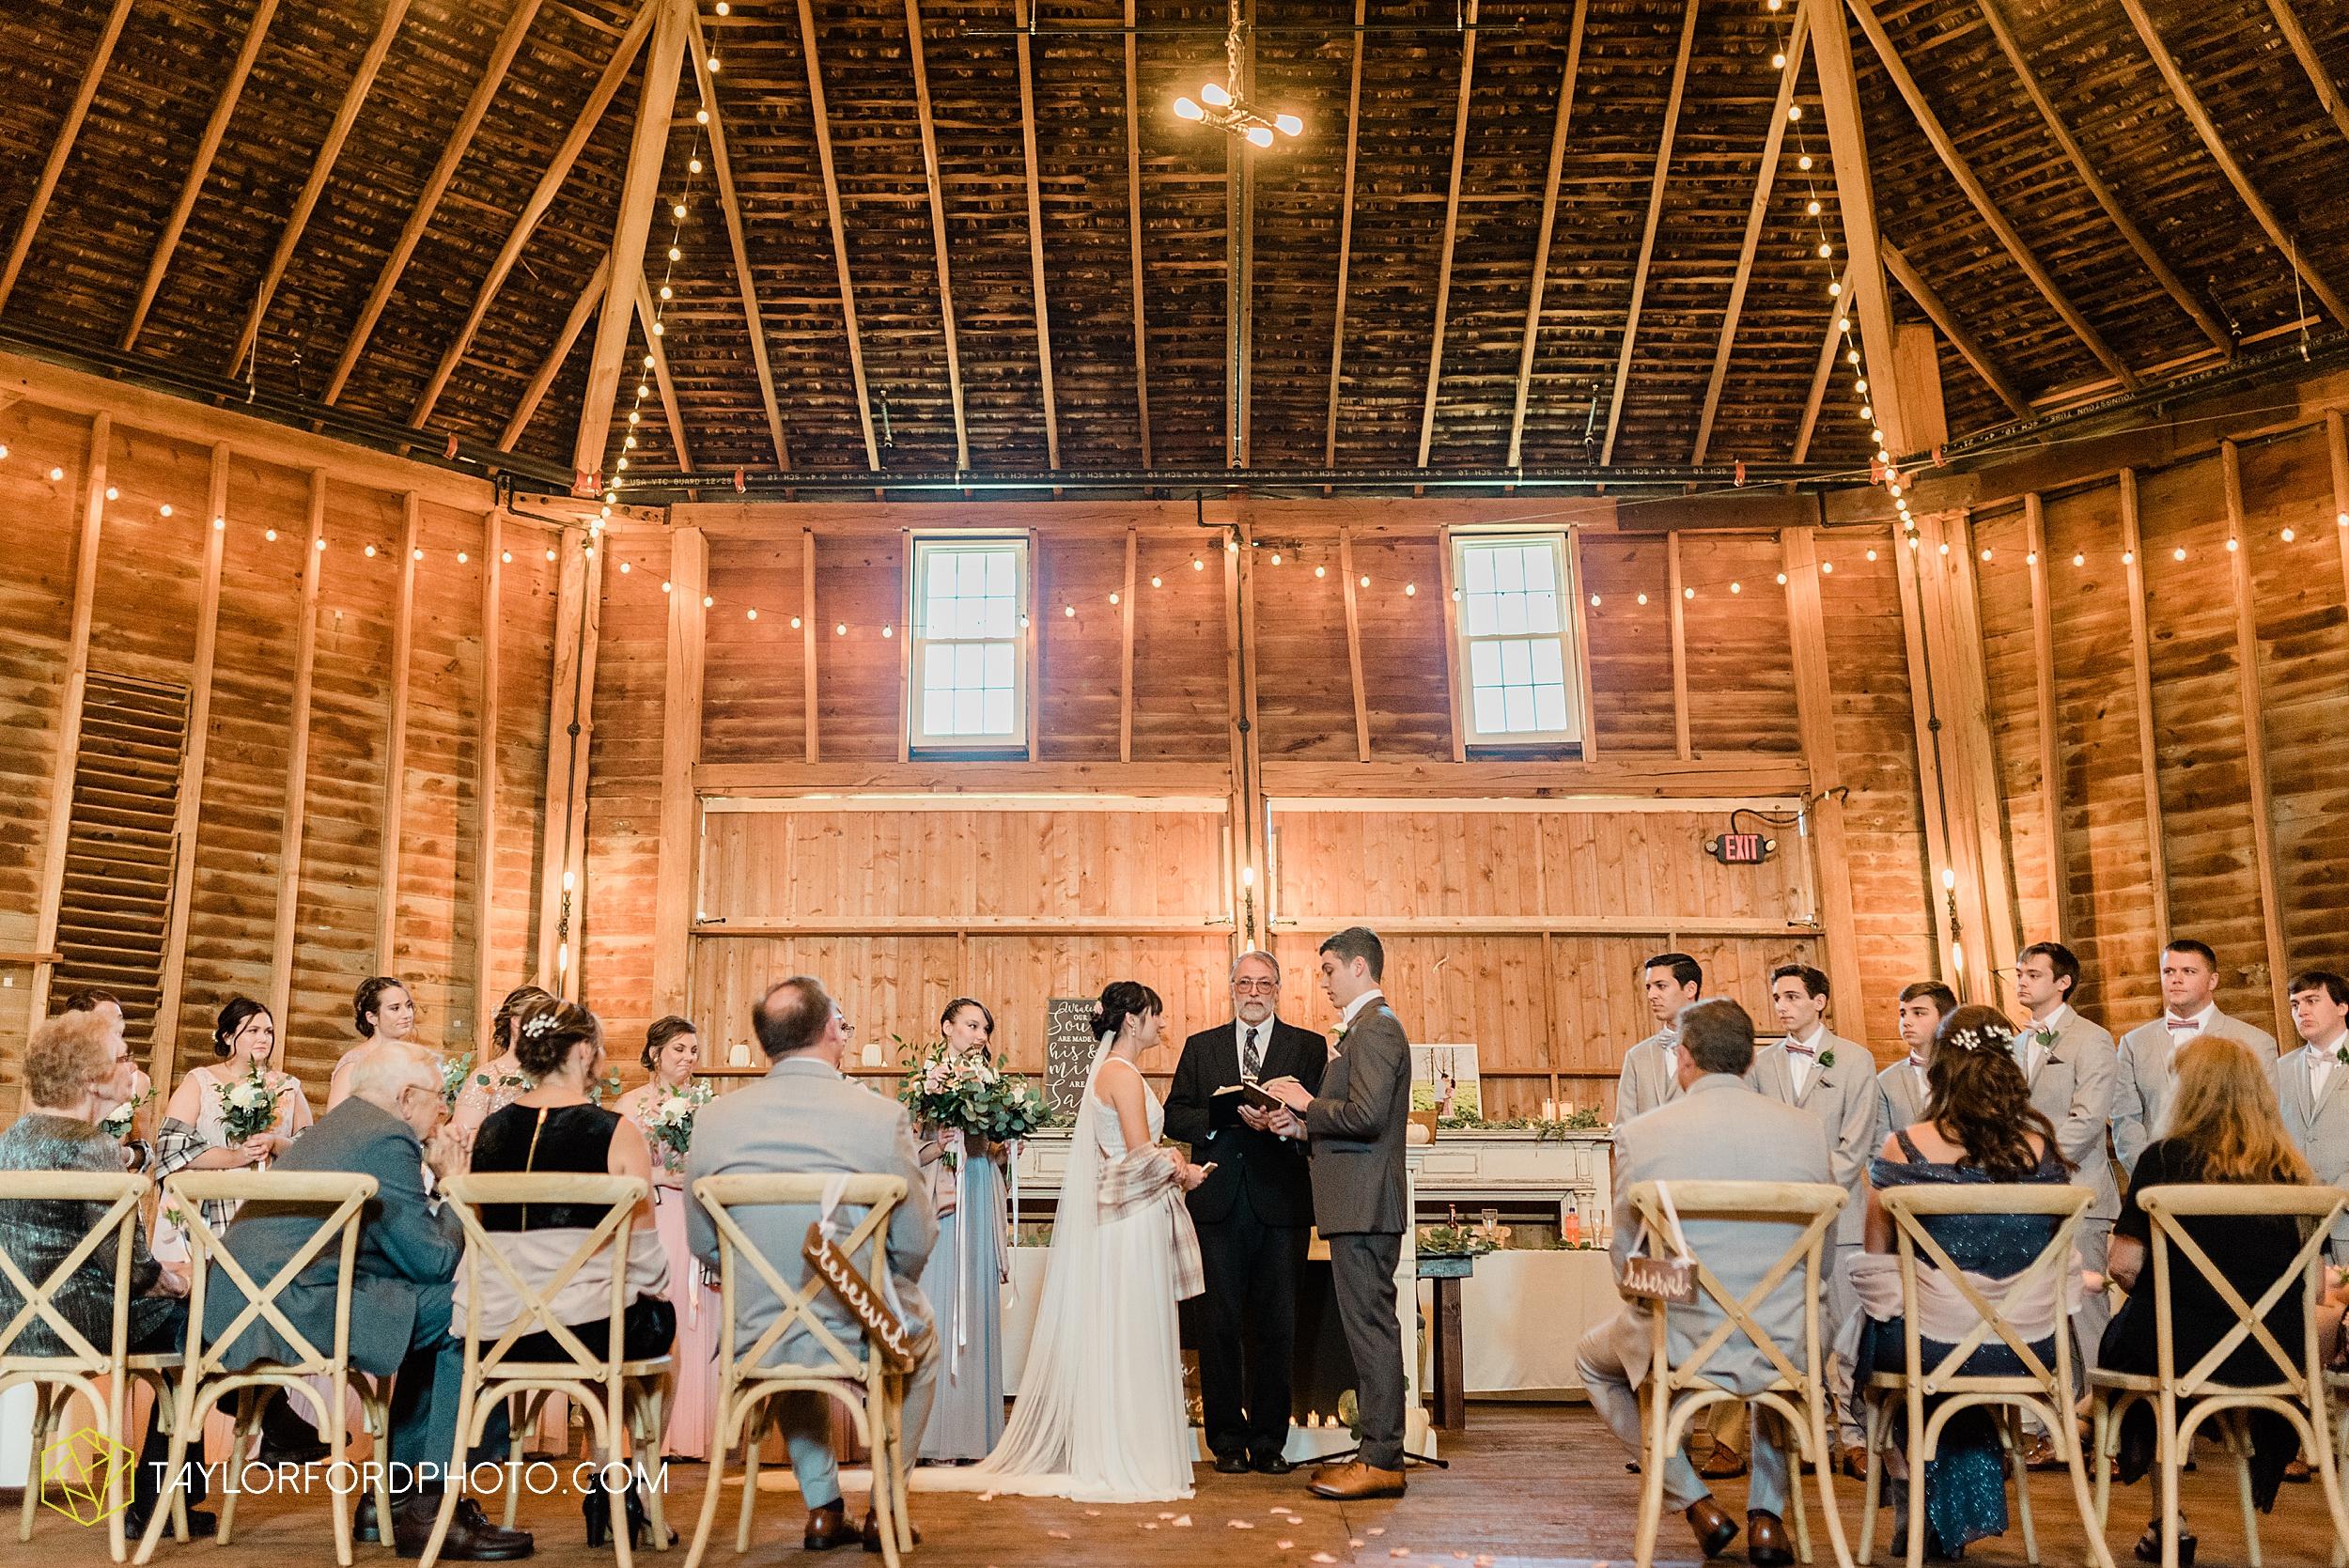 marissa-nicole-nick-daeger-orrmont-estate-farm-wedding-piqua-dayton-troy-ohio-fall-photographer-taylor-ford-photography_1528.jpg